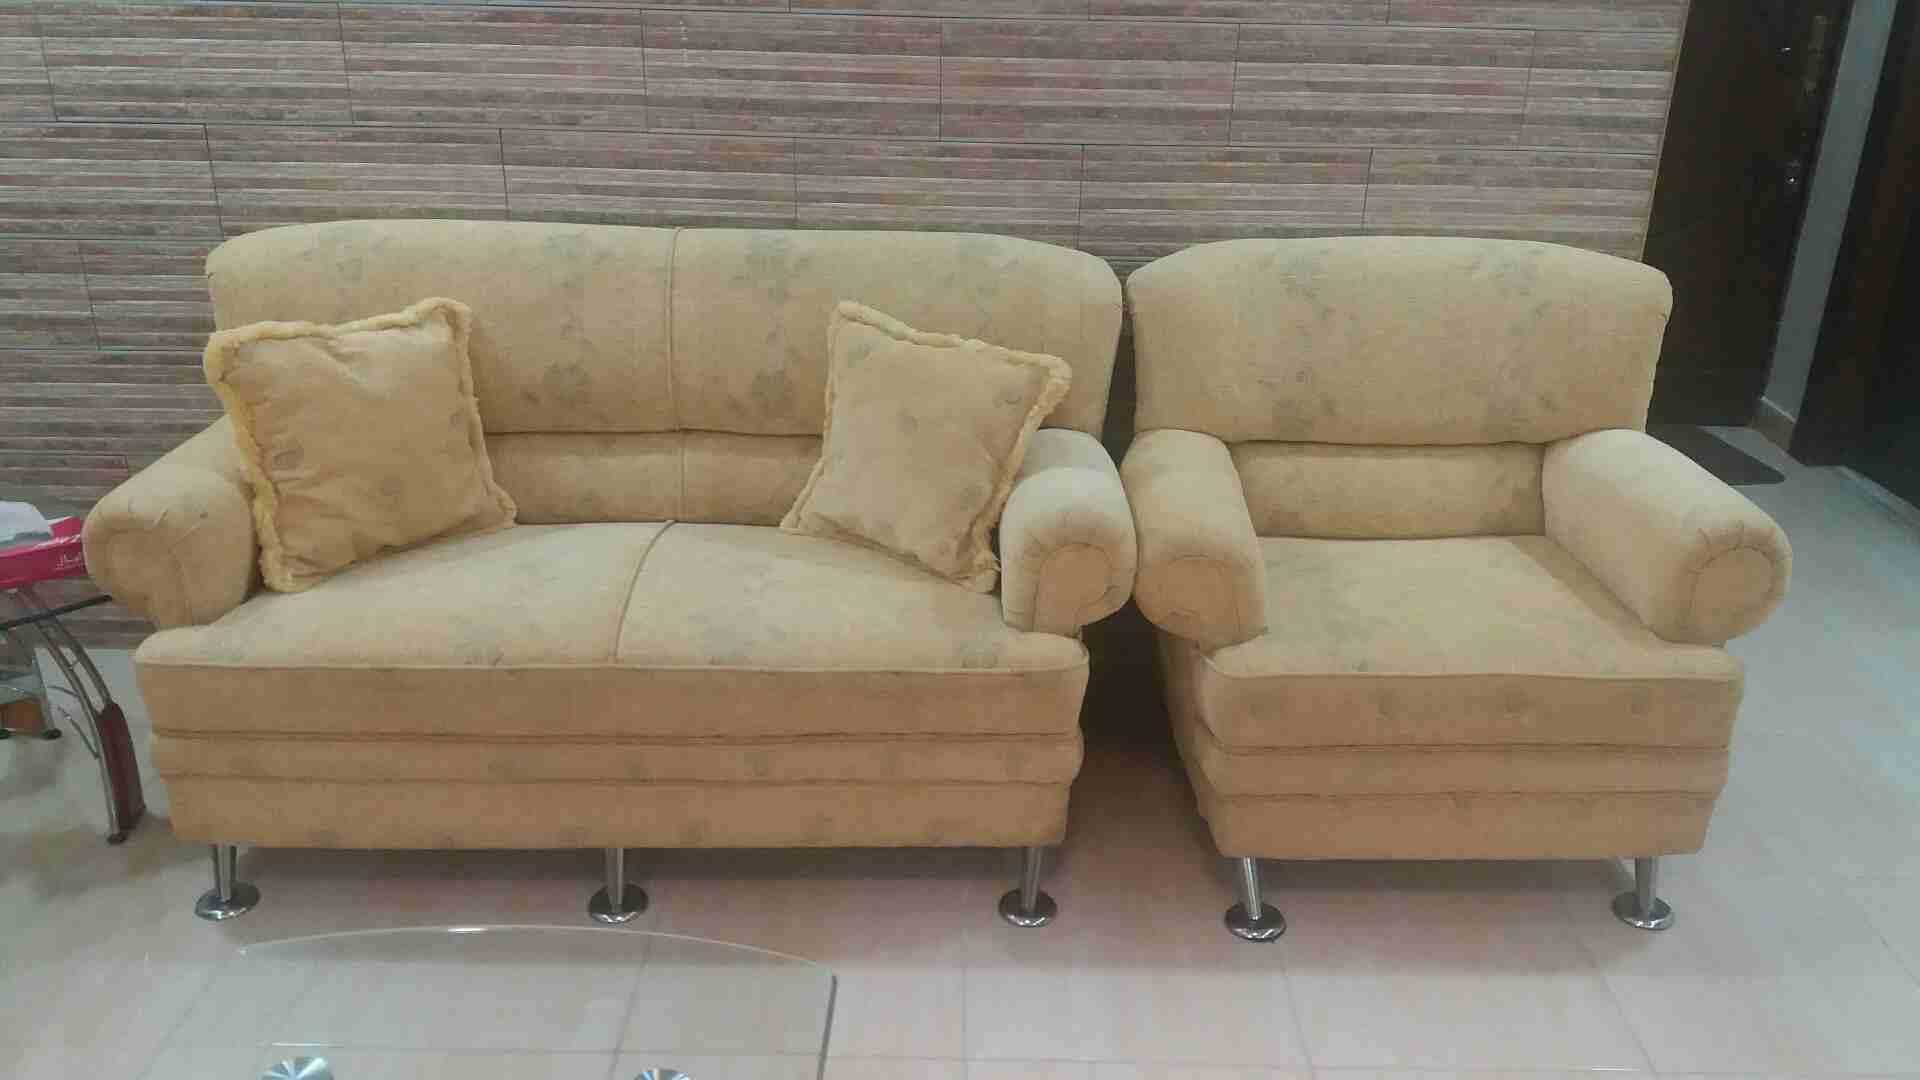 all new furniture-  طقم كنب 8 مقاعد تفصيل...